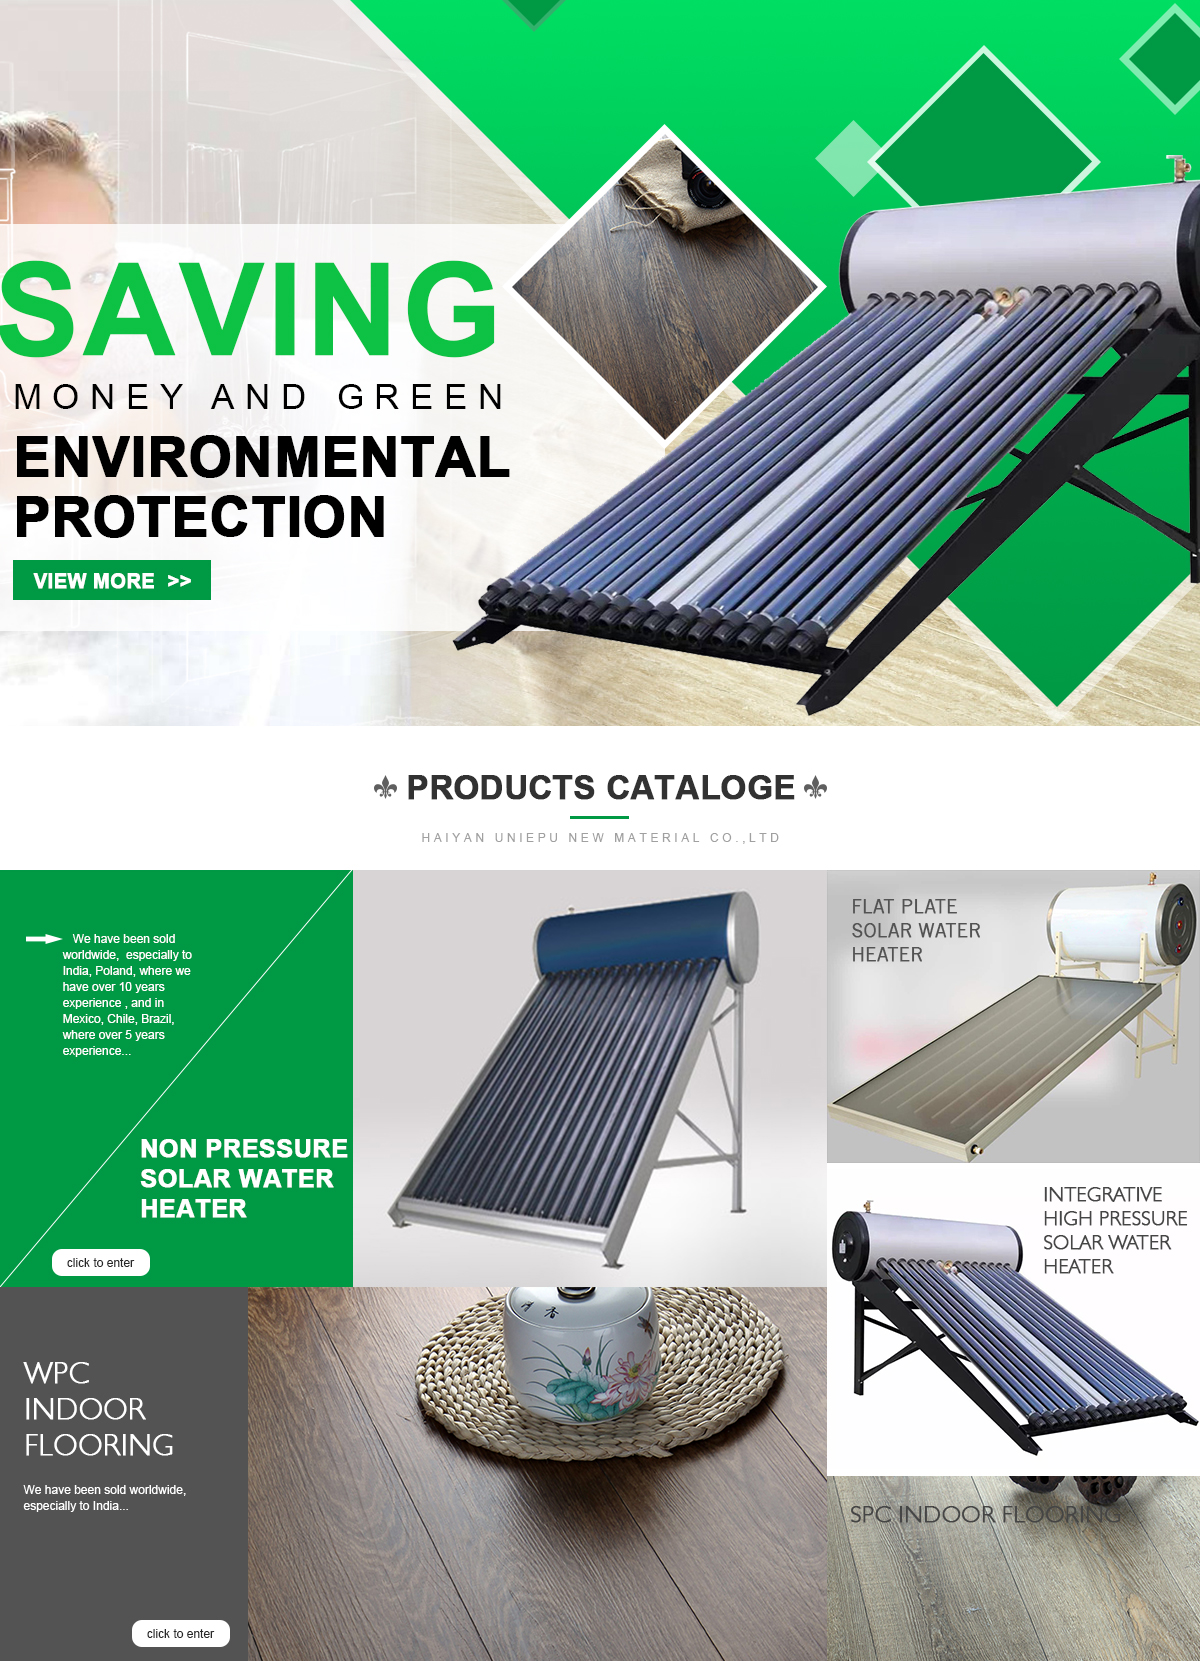 Haiyan Uniepu New Material Co., Ltd.   Flat Plate Solar Water Heater,  Integrative High Pressure Solar Water Heater